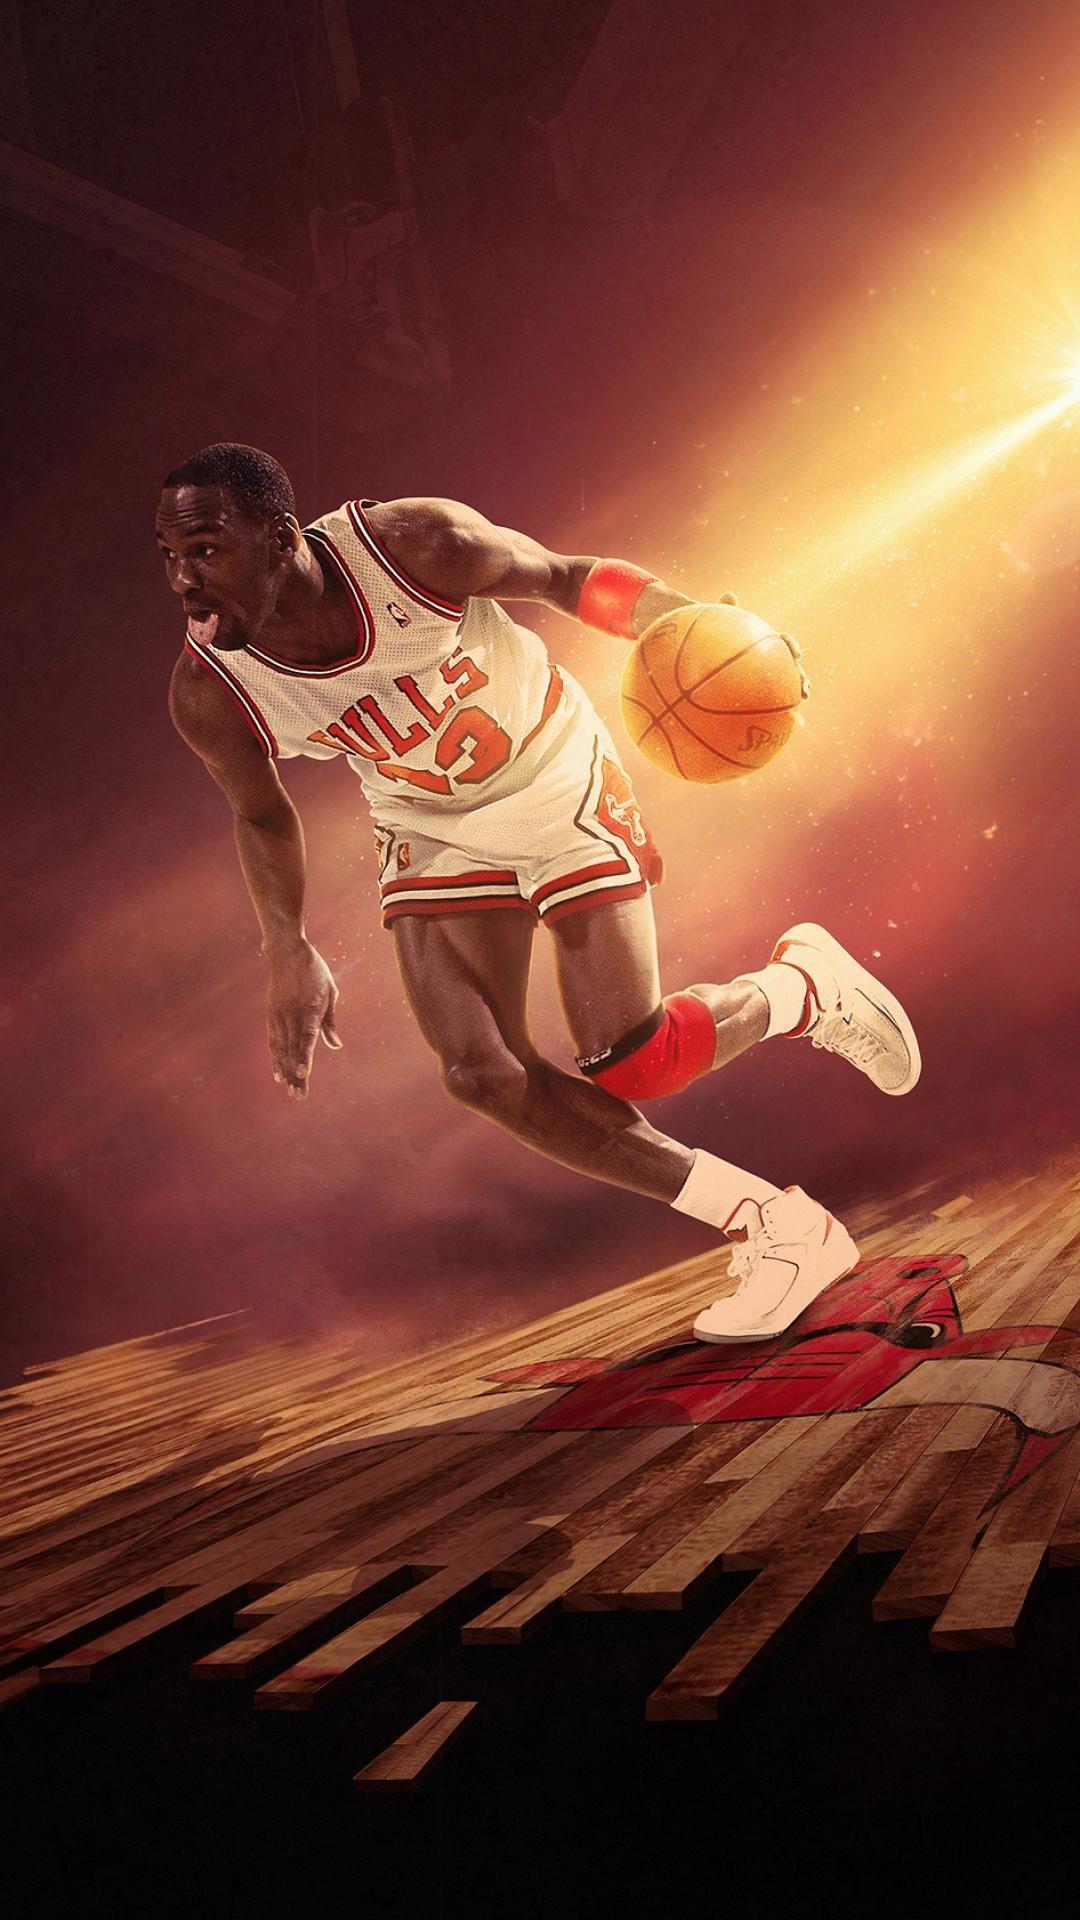 wallpaper.wiki-Michael-Jordan -Chicago-Bulls-Legend-Basketball-Sports-NBA-PIC-WPC009931